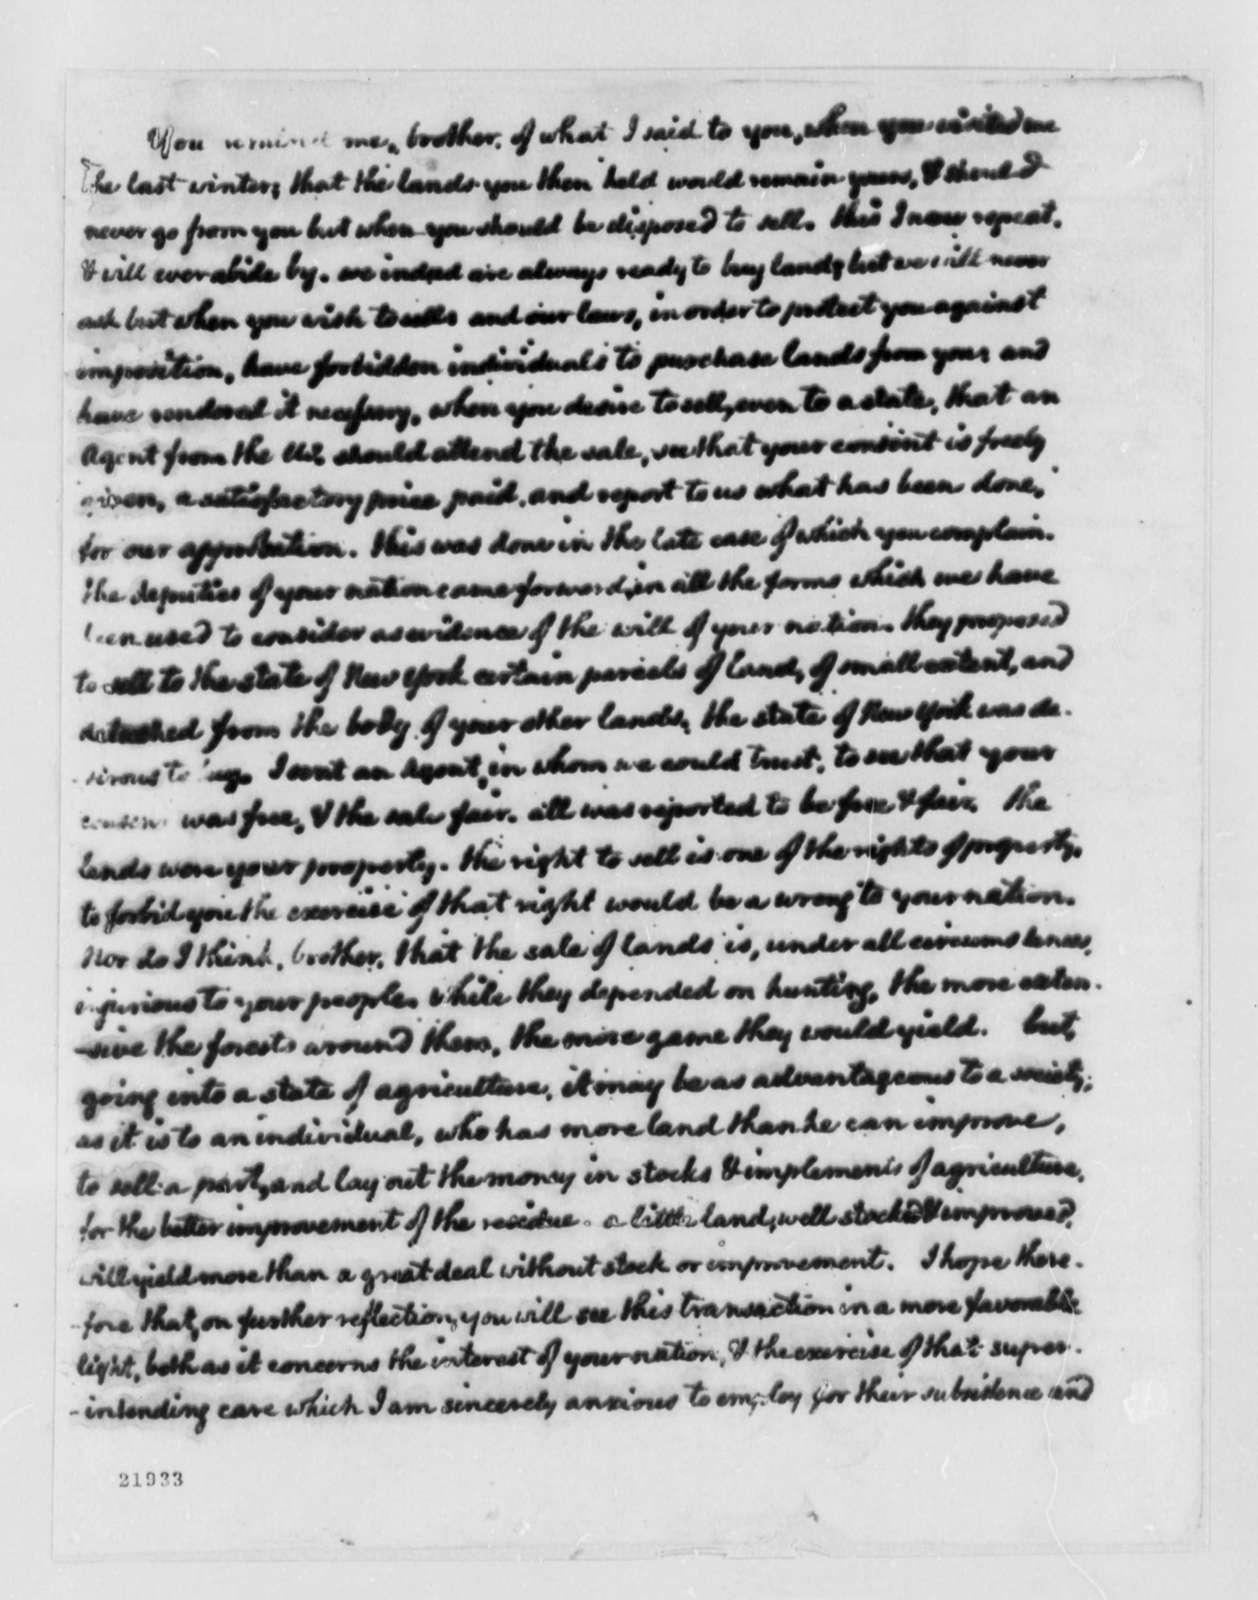 Thomas Jefferson to Chief Handsome Lake, November 3, 1802